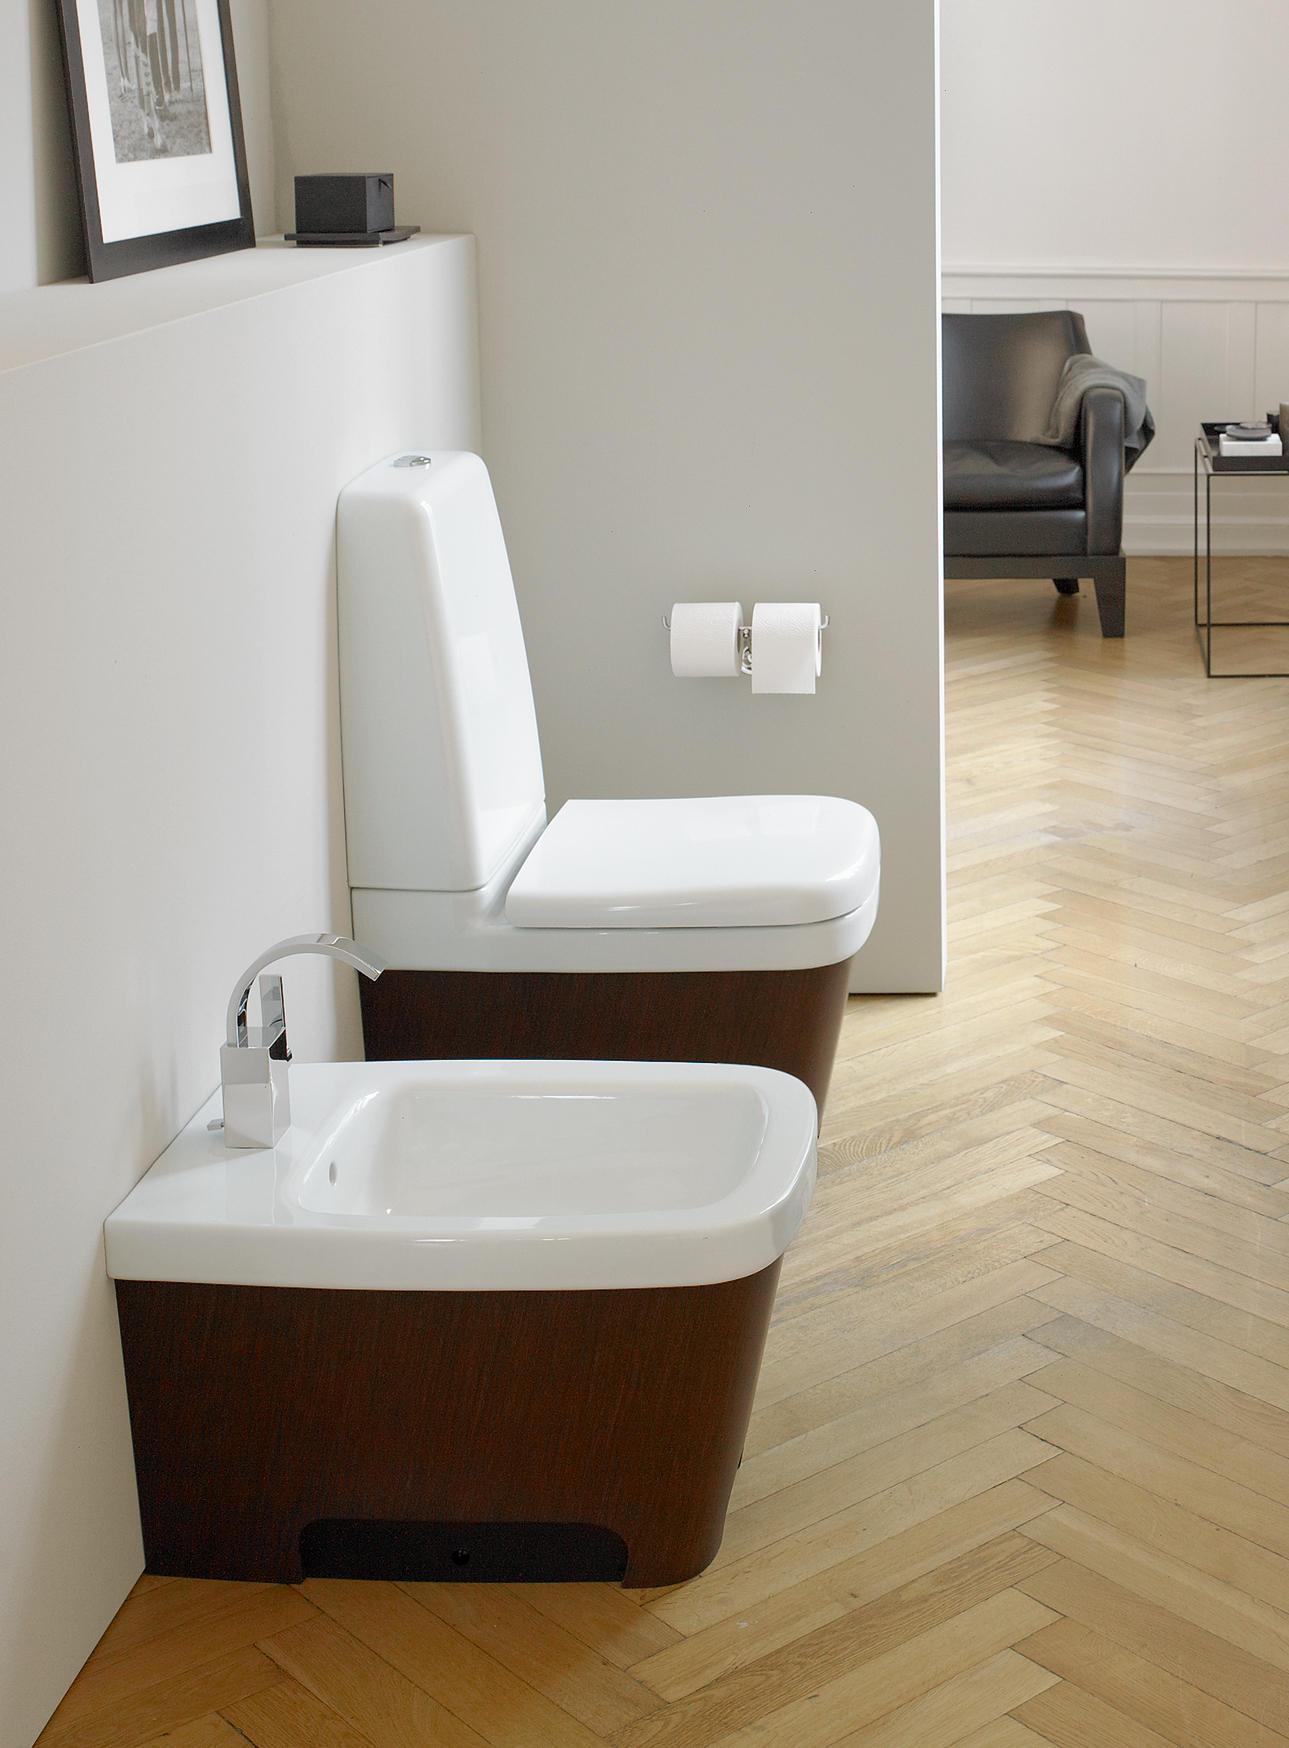 esplanade - cabinet - wall cabinets from duravit | architonic, Badezimmer ideen